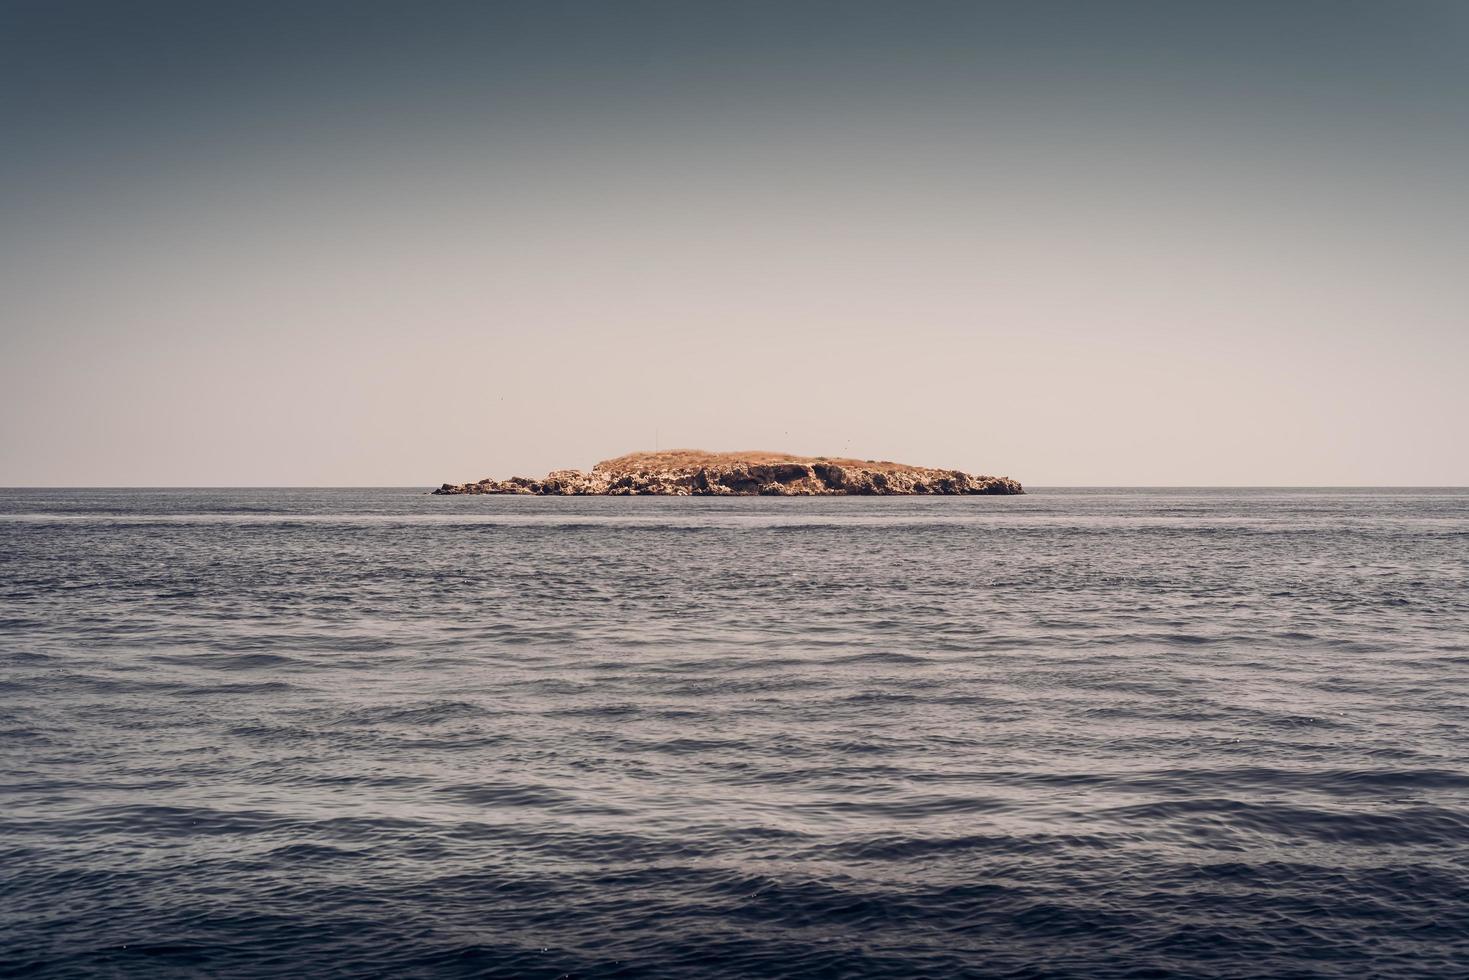 st. george island, cypern foto